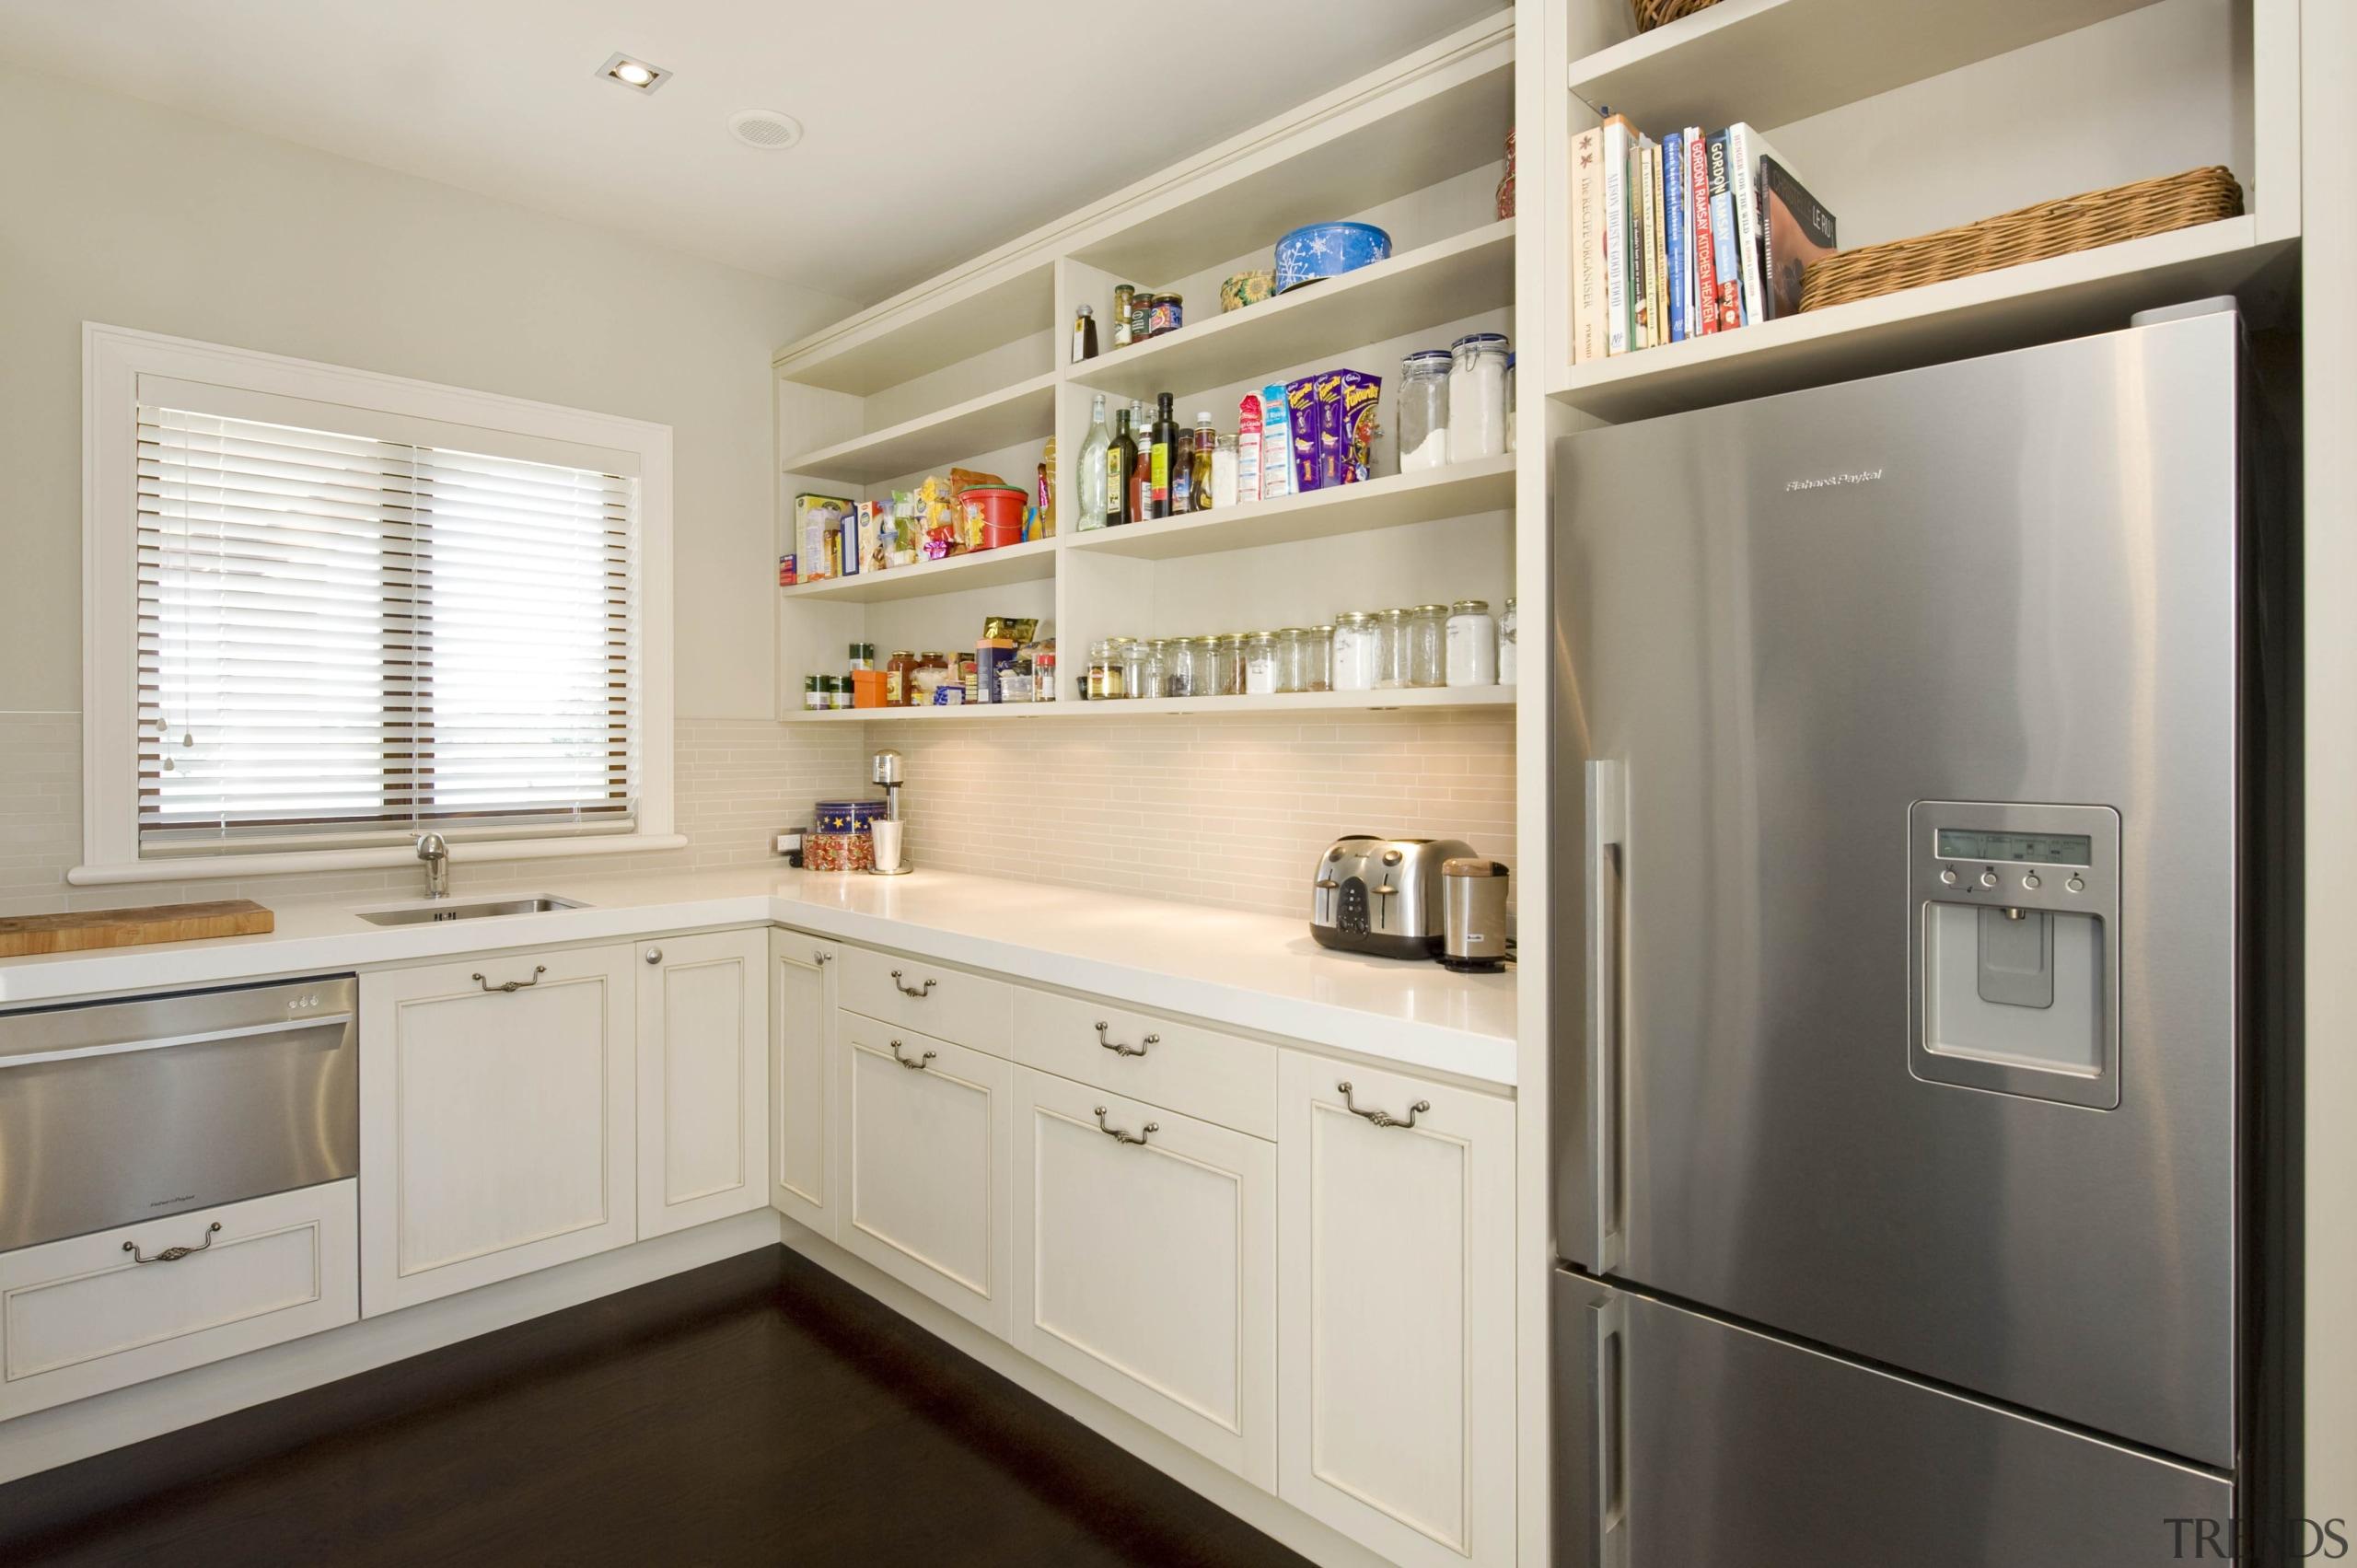 Karaka - cabinetry   countertop   cuisine classique cabinetry, countertop, cuisine classique, home appliance, interior design, kitchen, room, gray